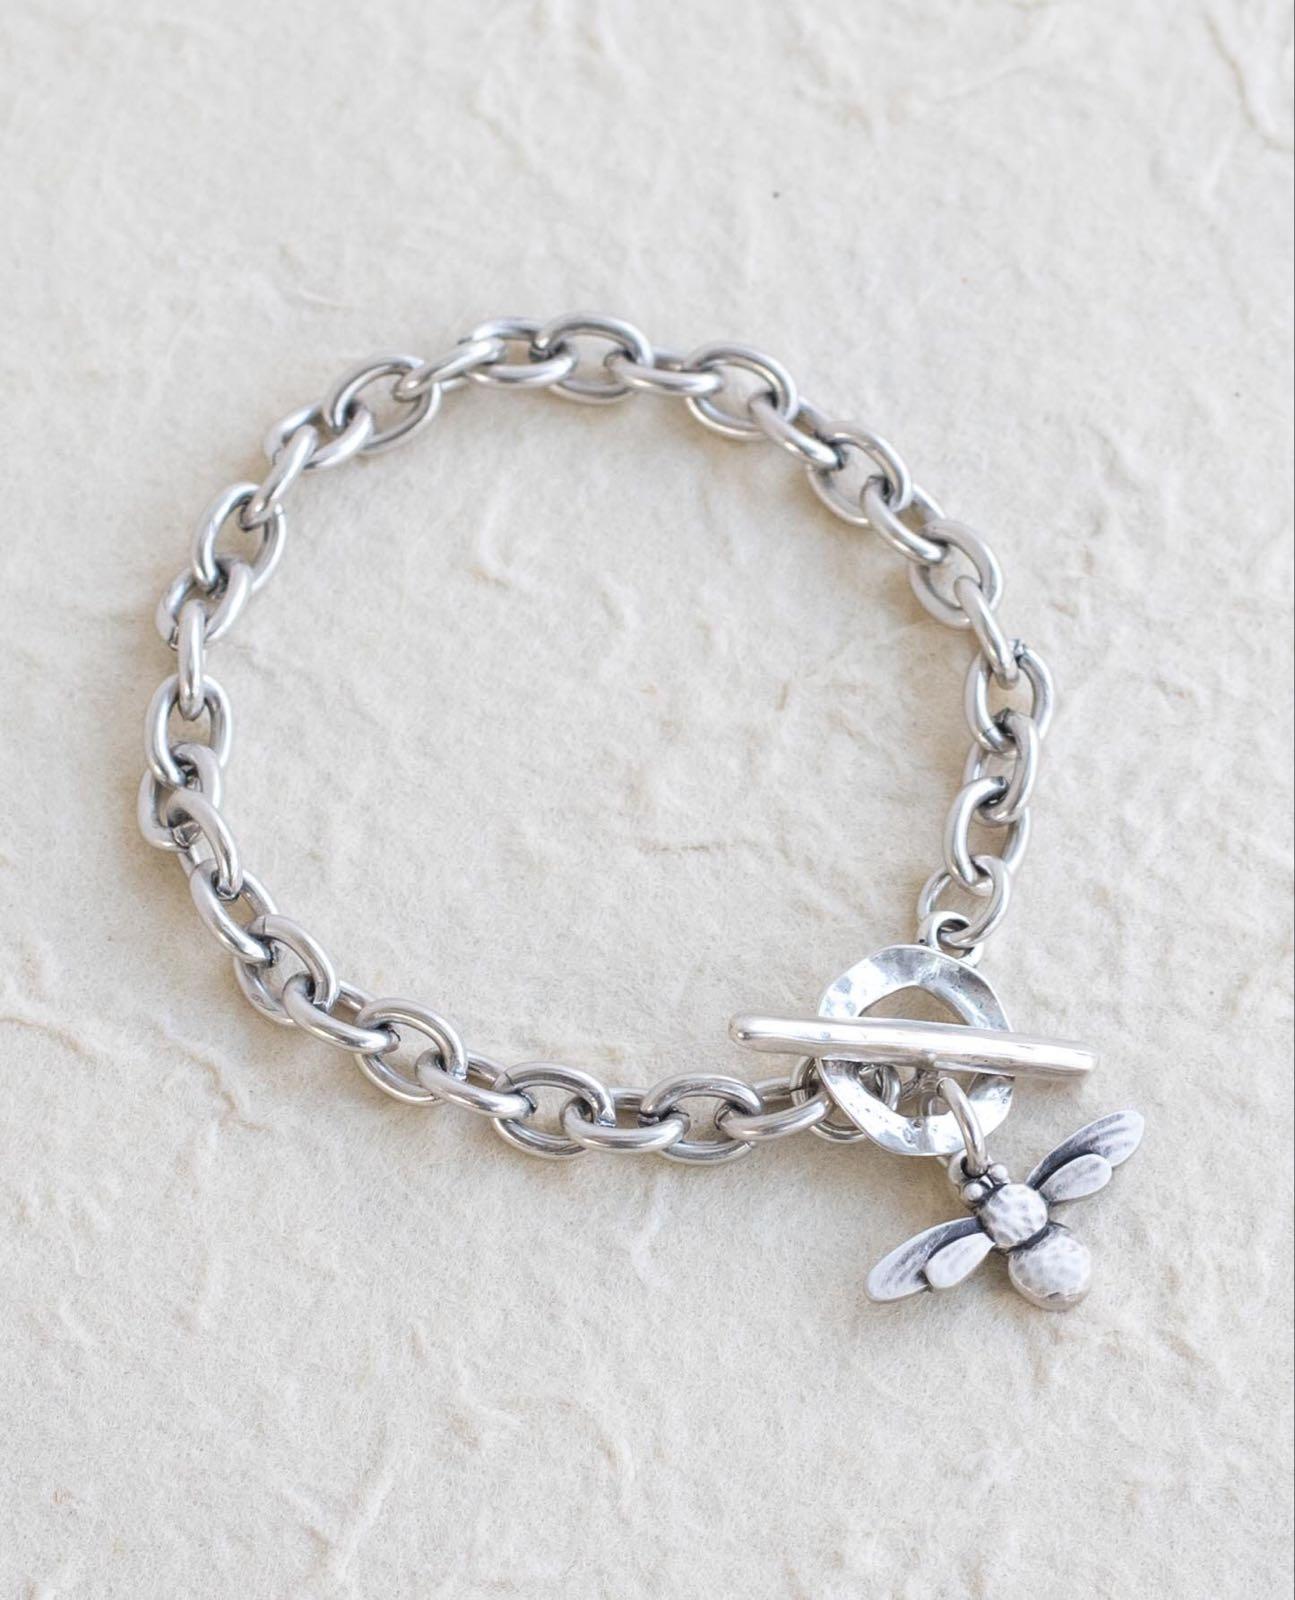 Danon bee bracelet